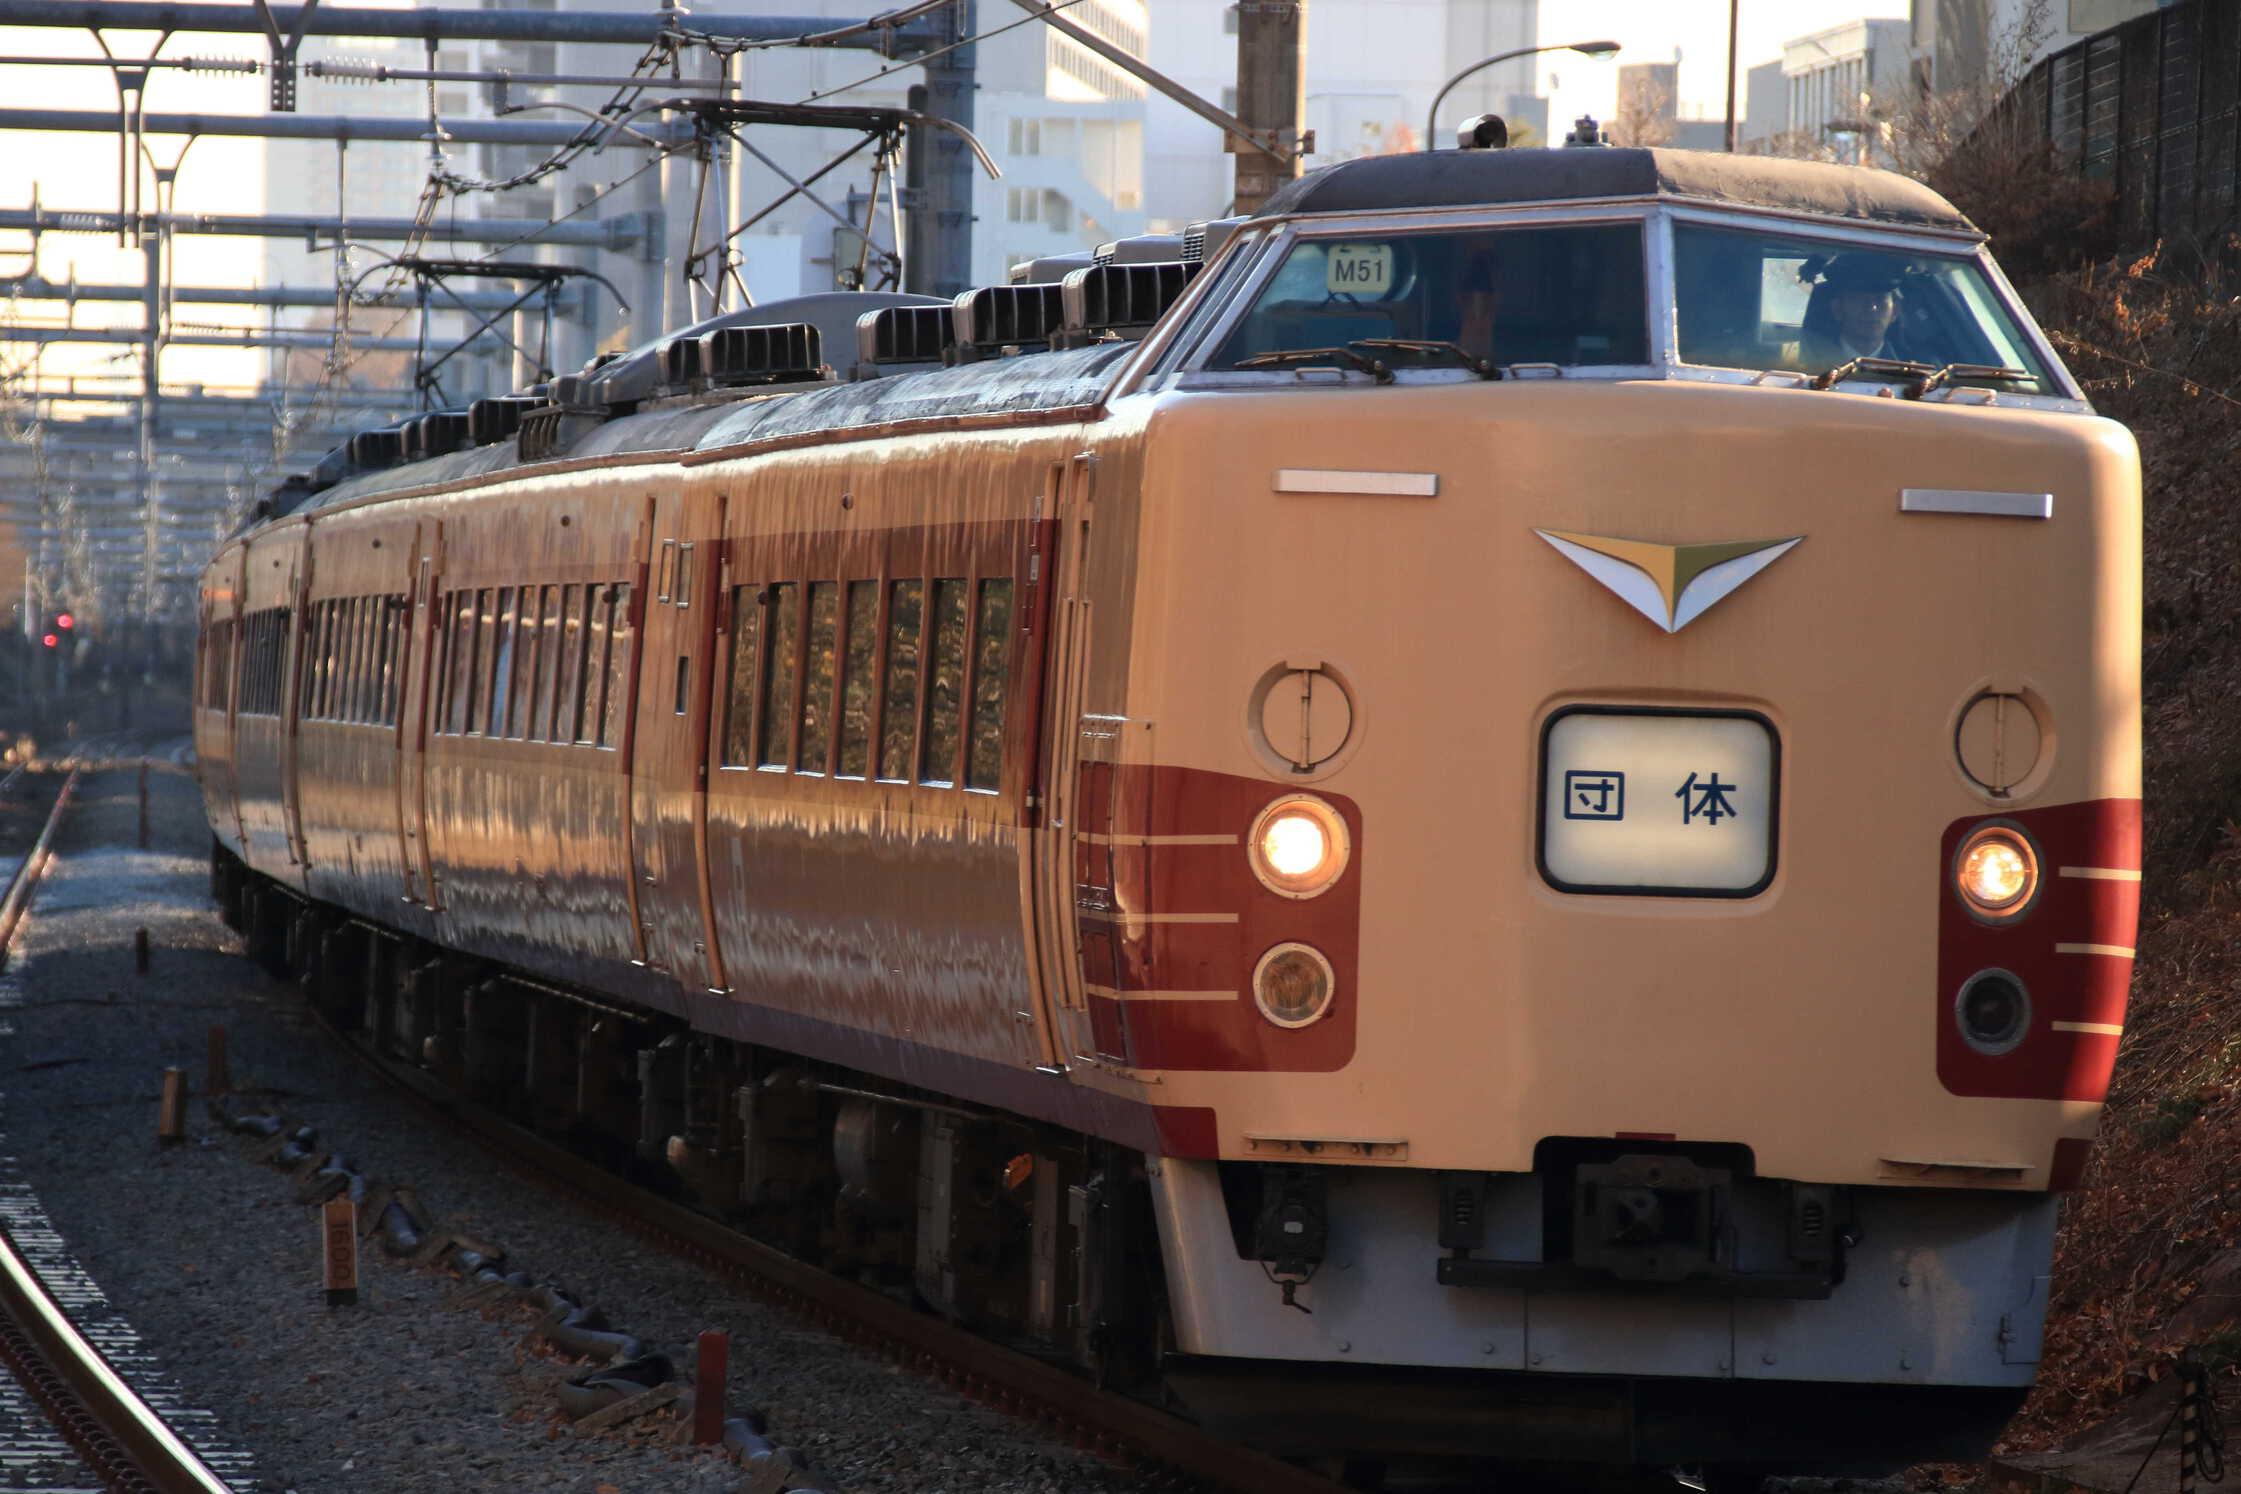 9431M 団臨(西1203, 新宿→松本) あずさ50周年記念 189系で行く松本の旅 189系 八トタM51編成